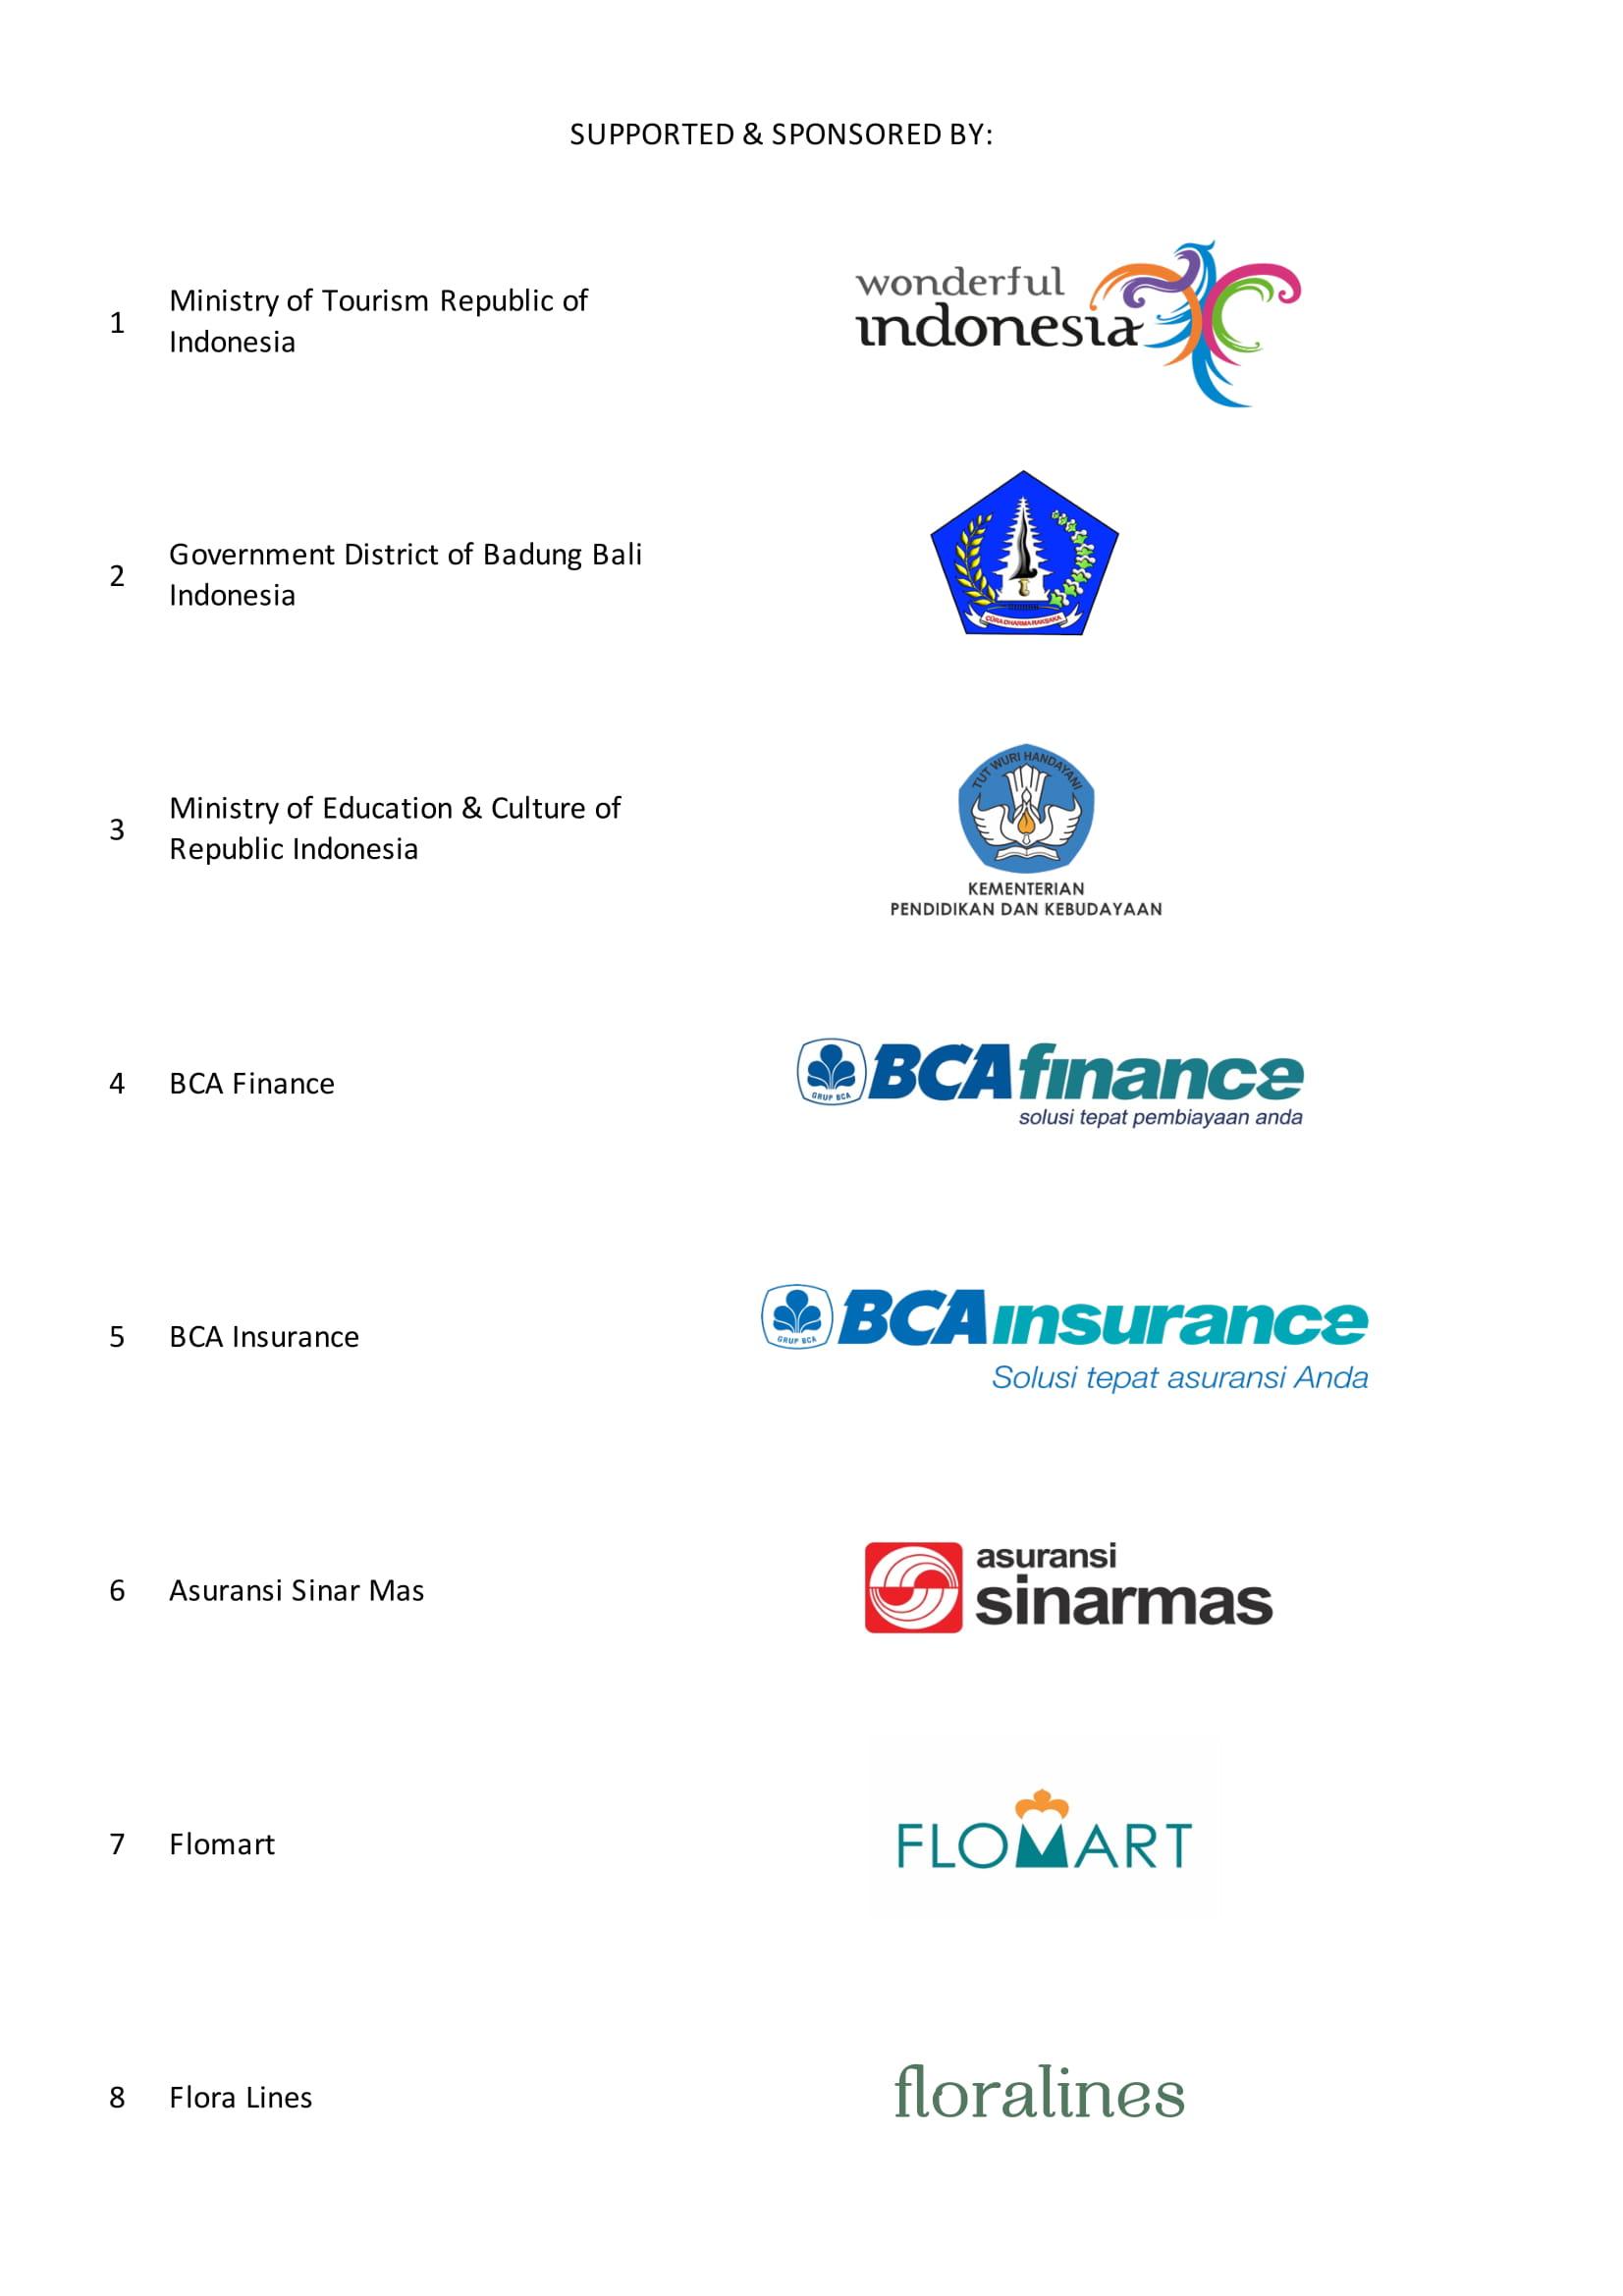 SUPPORTS & SPONSORS 2019 Bali-1.jpg